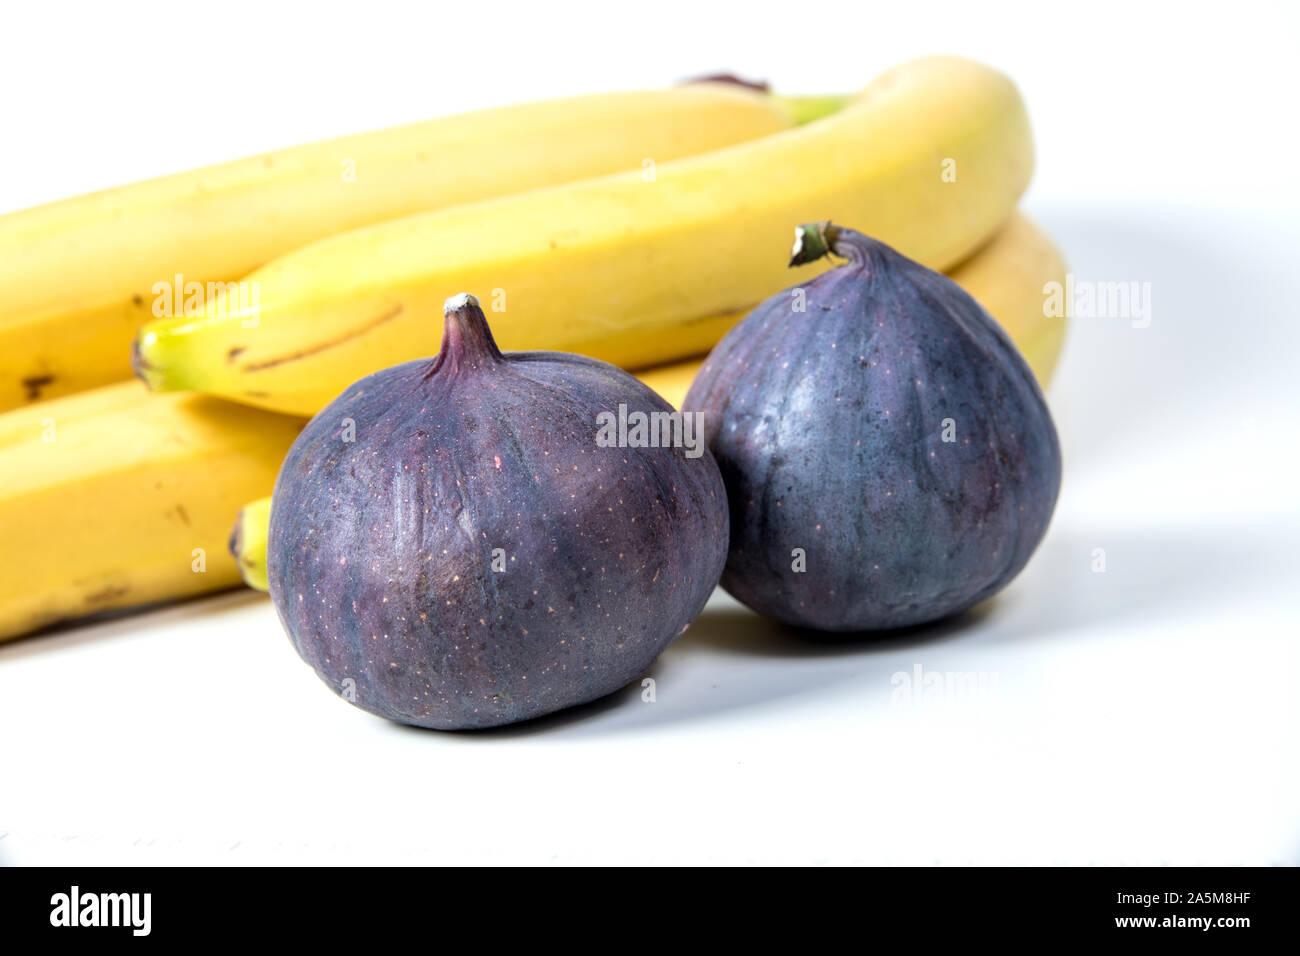 figs and bananas, beautiful fruits, bananas, purple figs, close-up, vitamins concept, vegan food, healthy eating, Stock Photo